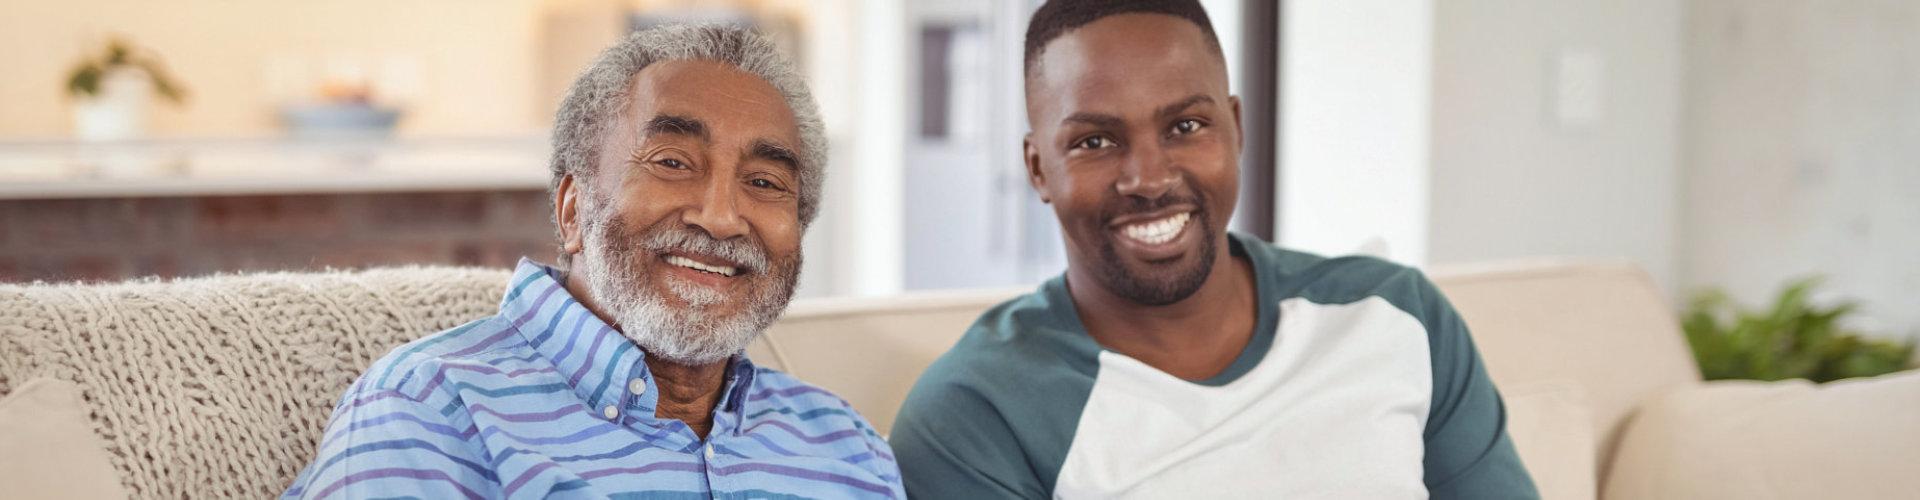 senior man with his son